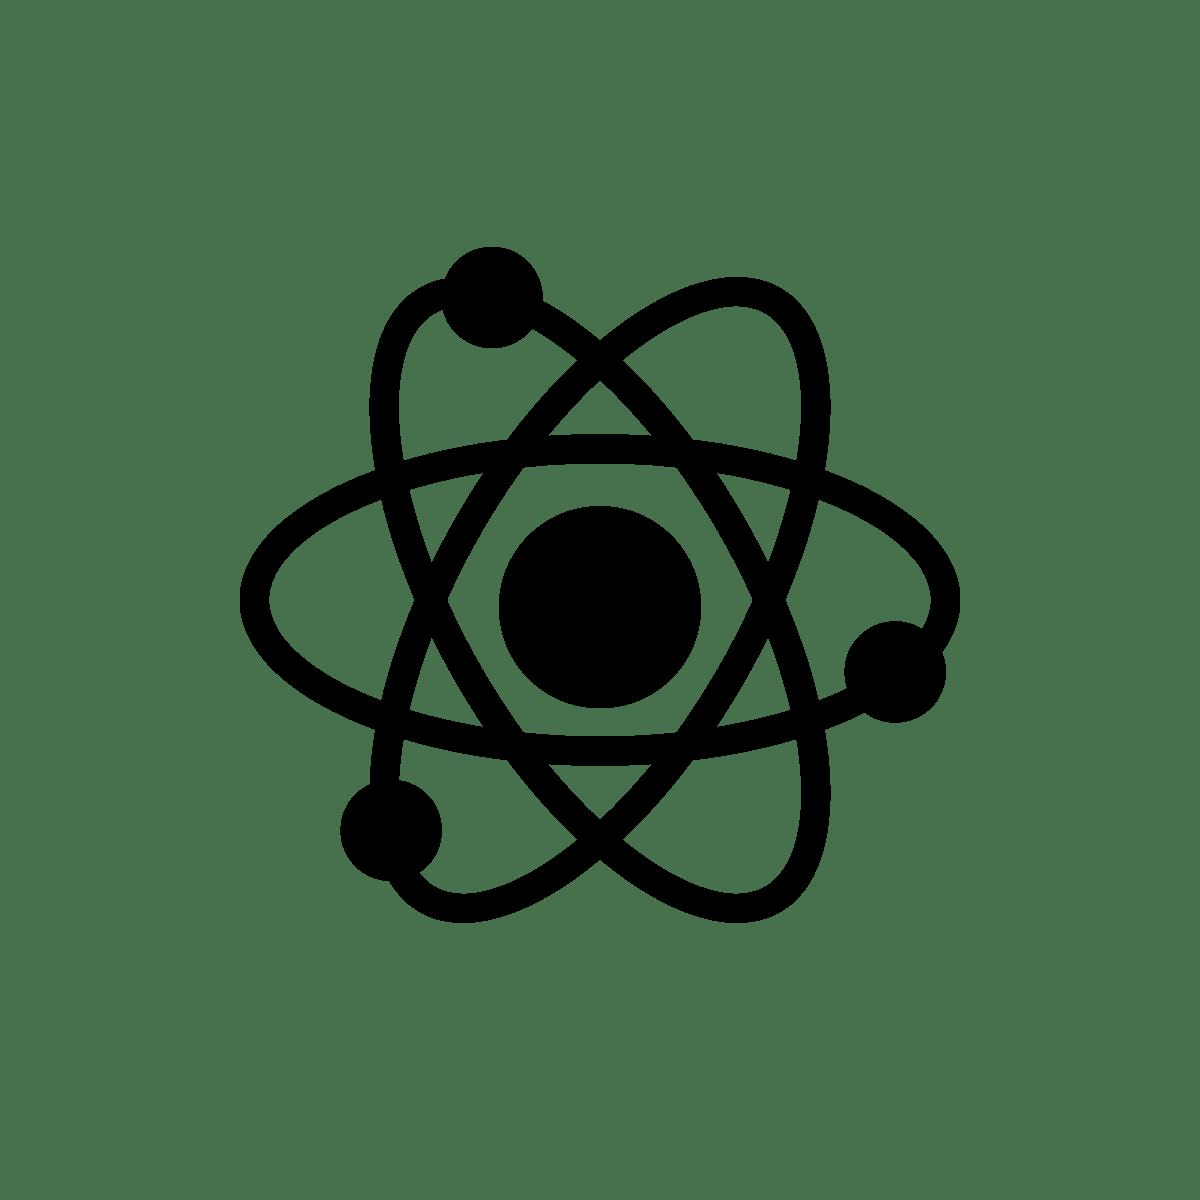 Scientist clipart research scientist. Science databases johnson public